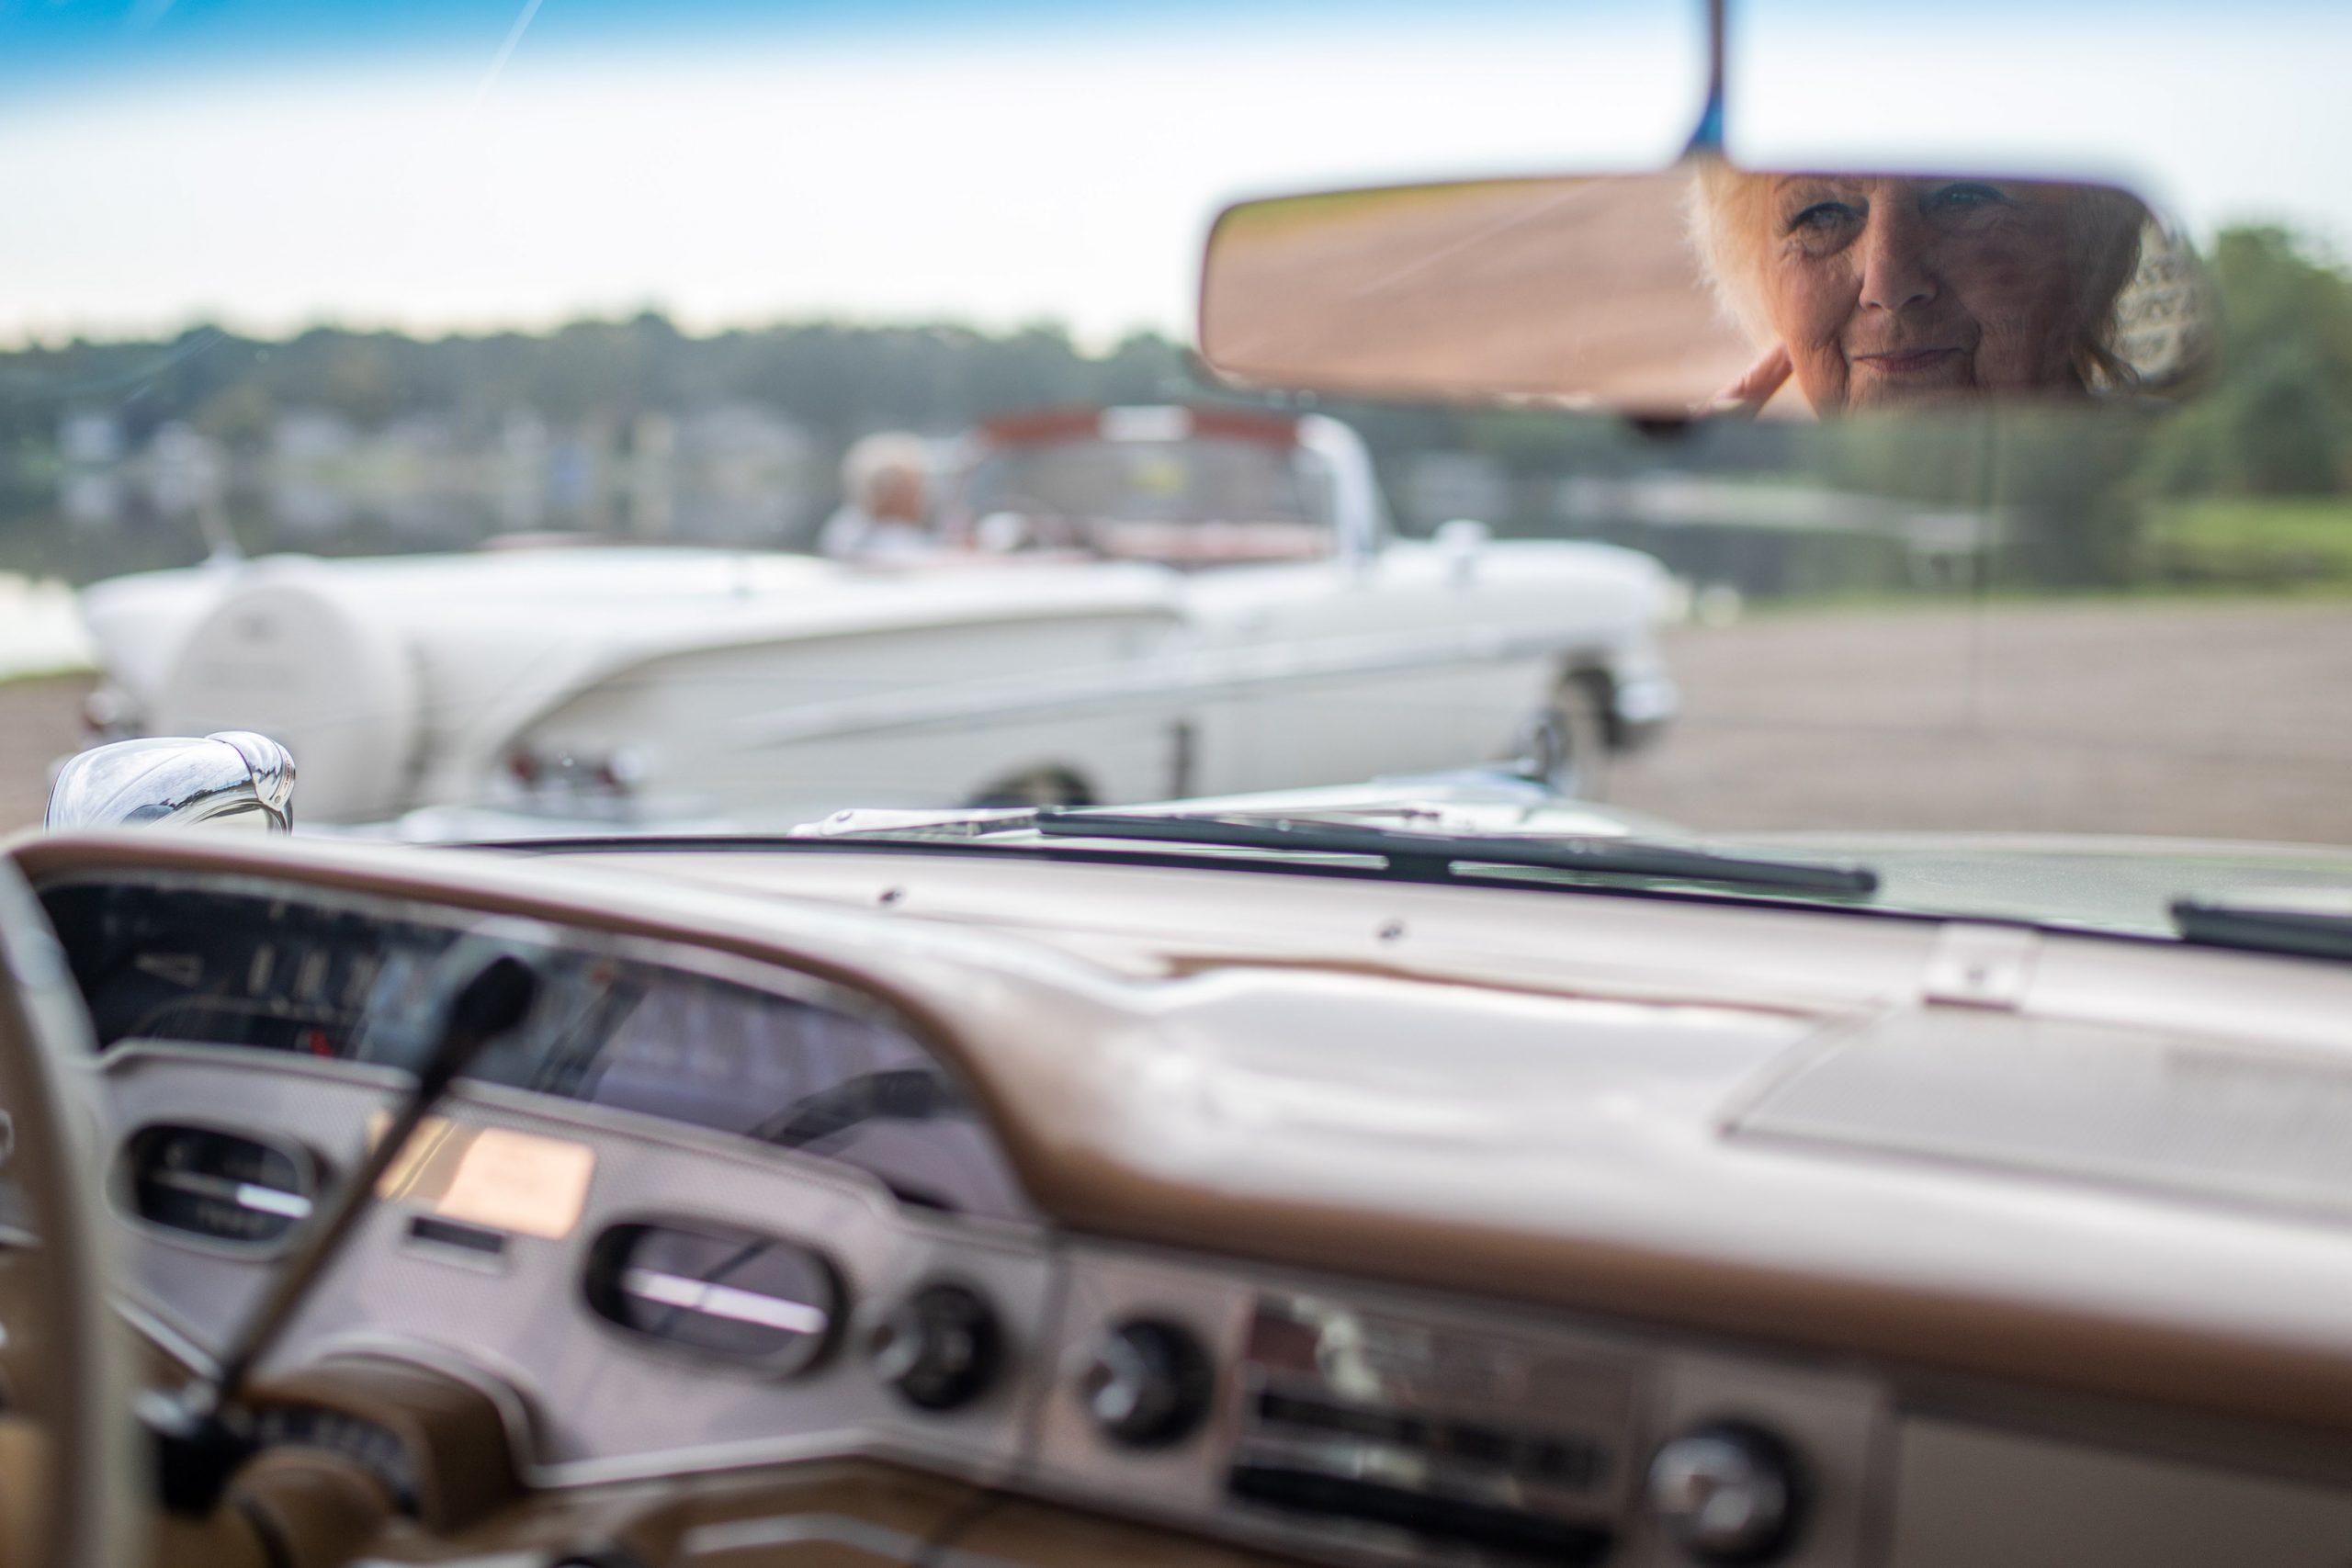 1958 Chevrolet Impala Owner In Mirror